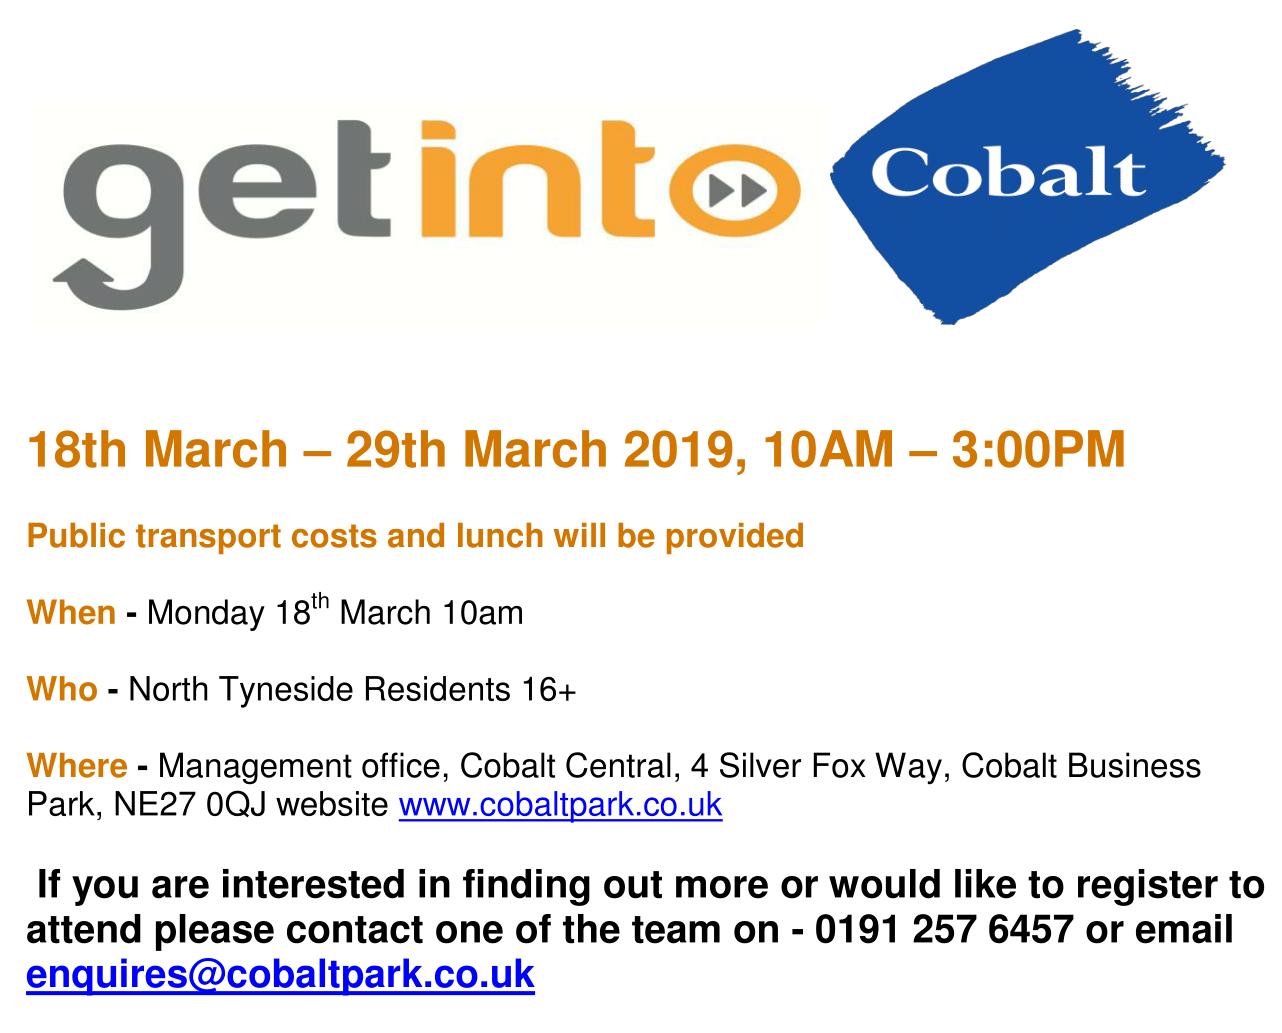 Get Into Cobalt